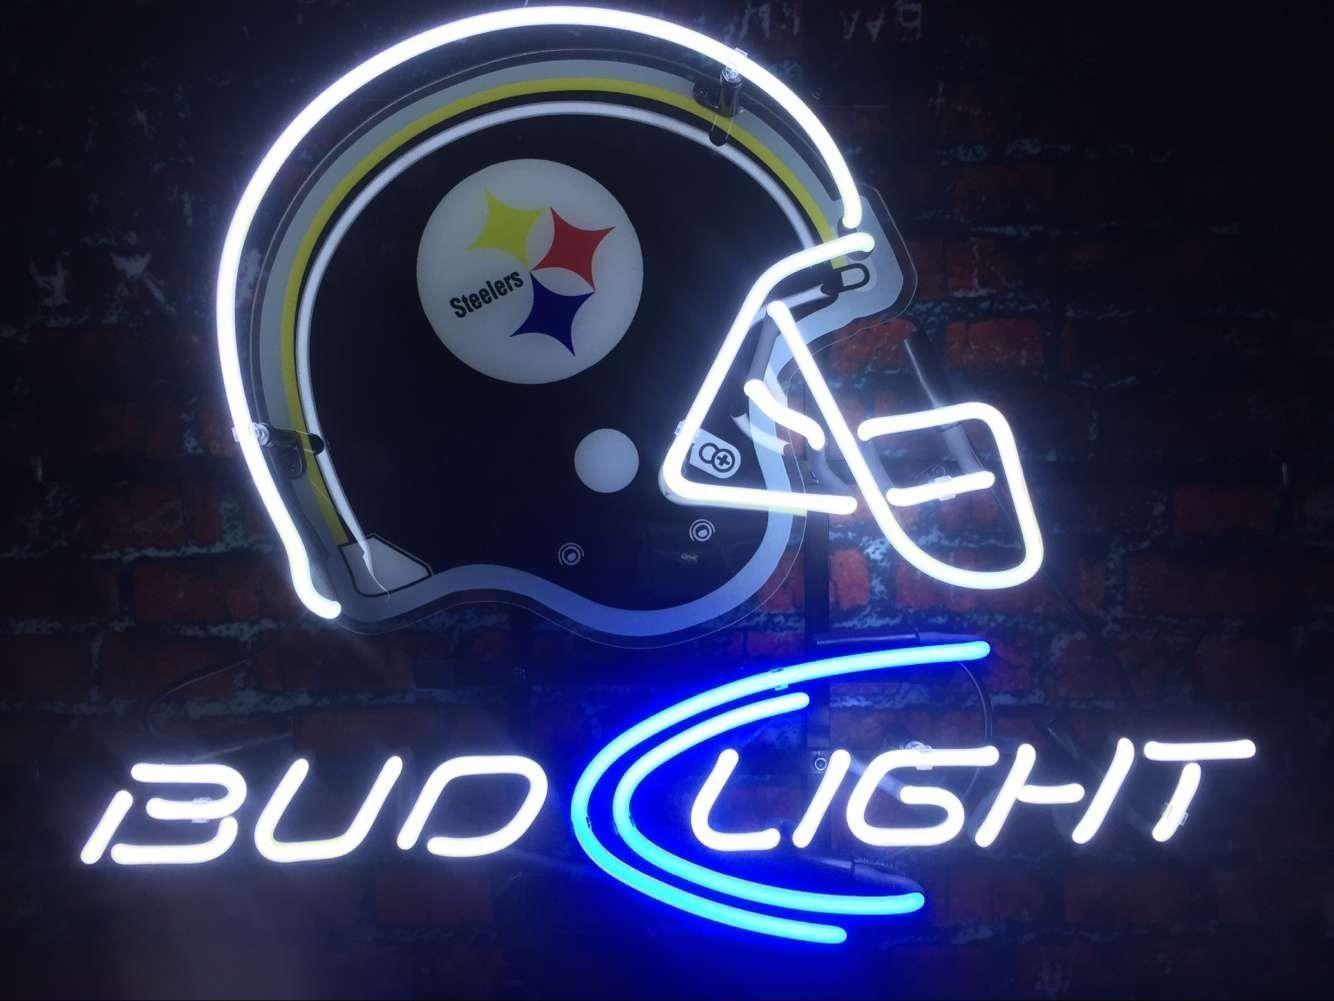 "New Pittsburgh Steelers Bud Light Helmet Beer Neon Sign 24""x20"""